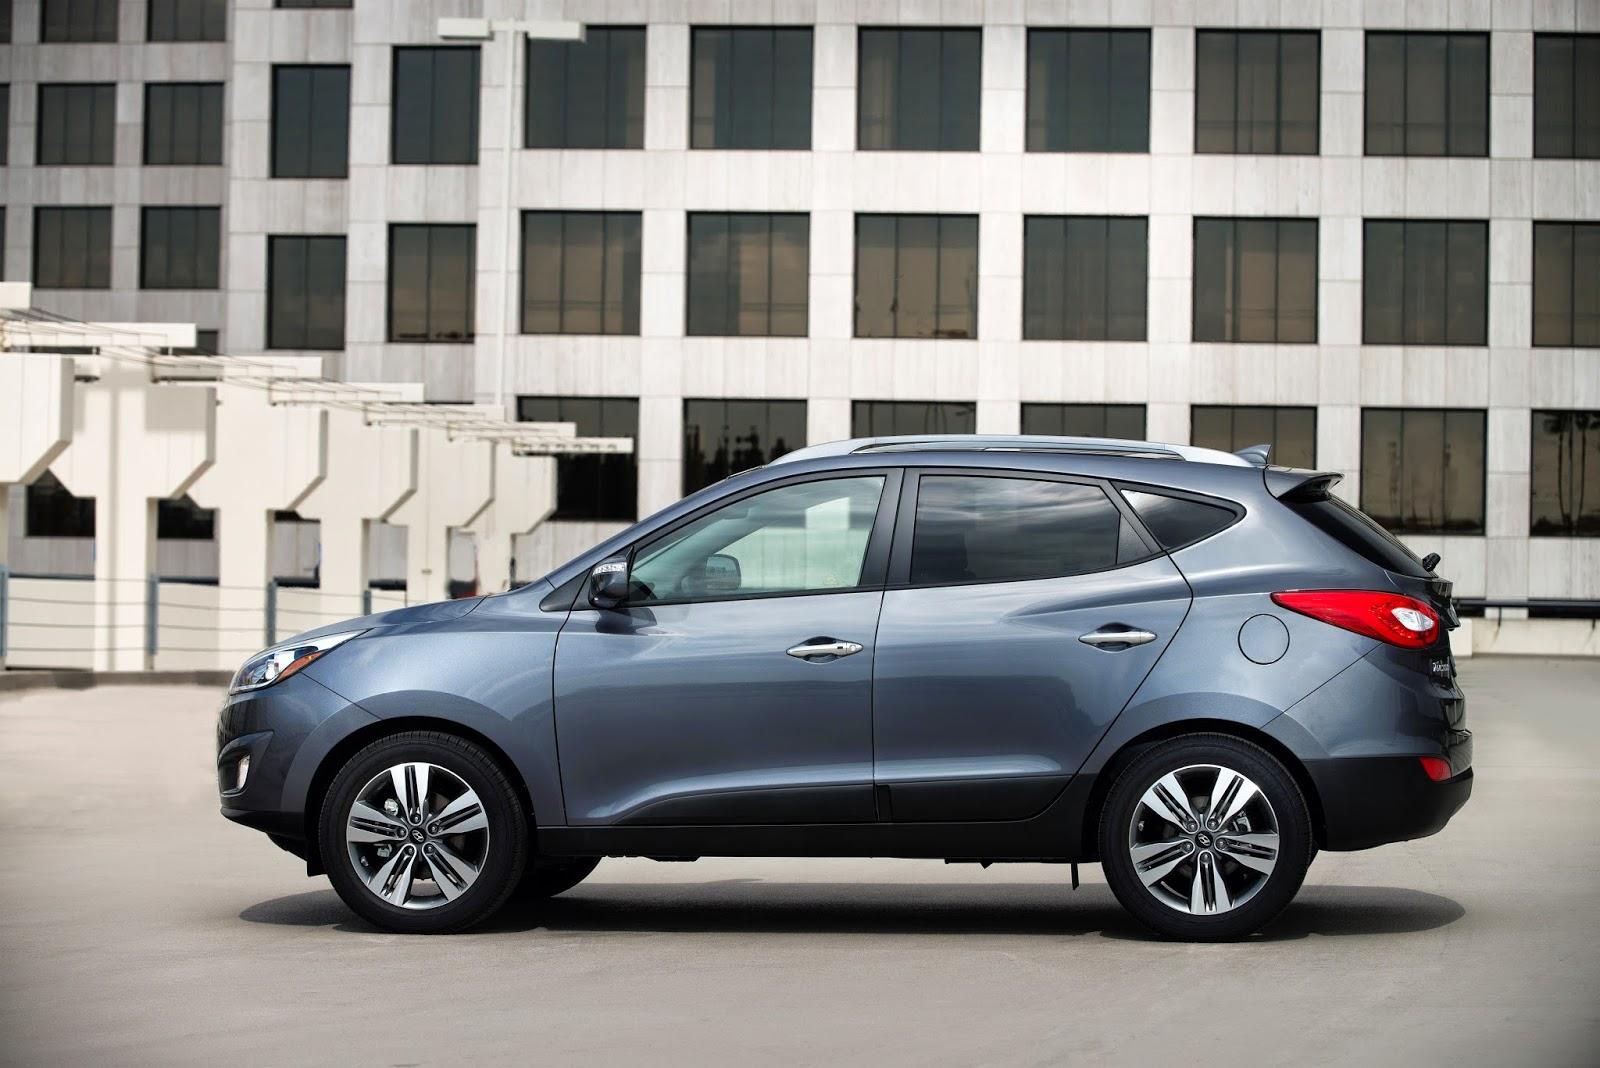 2014 Hyundai Tucson side view